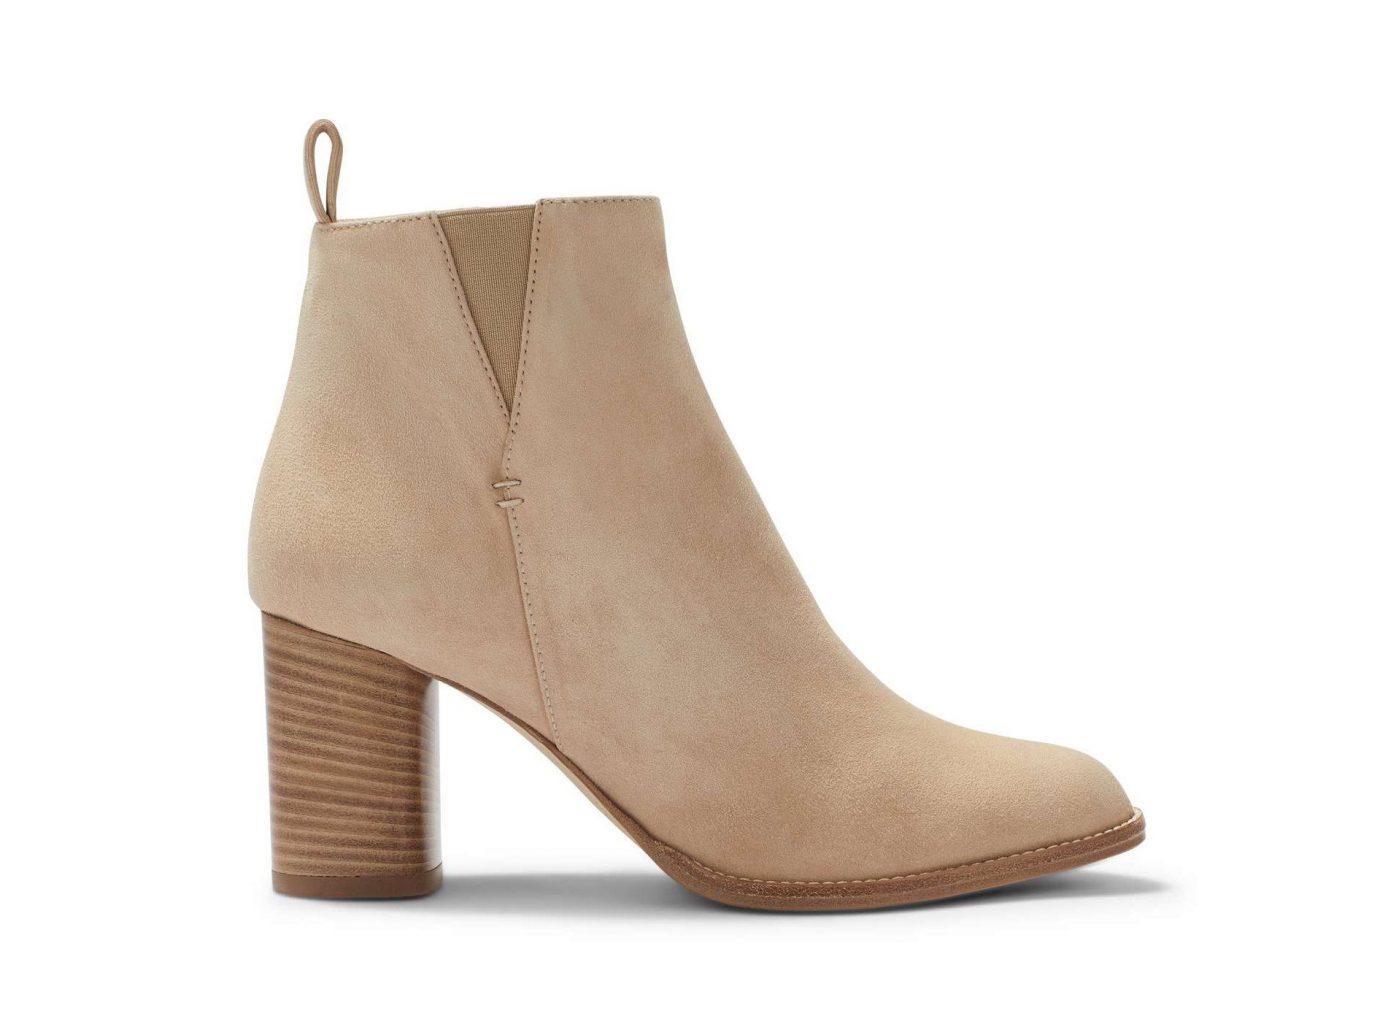 Spring Travel Style + Design Travel Shop khaki boot beige suede high heeled footwear shoe product design basic pump outdoor shoe